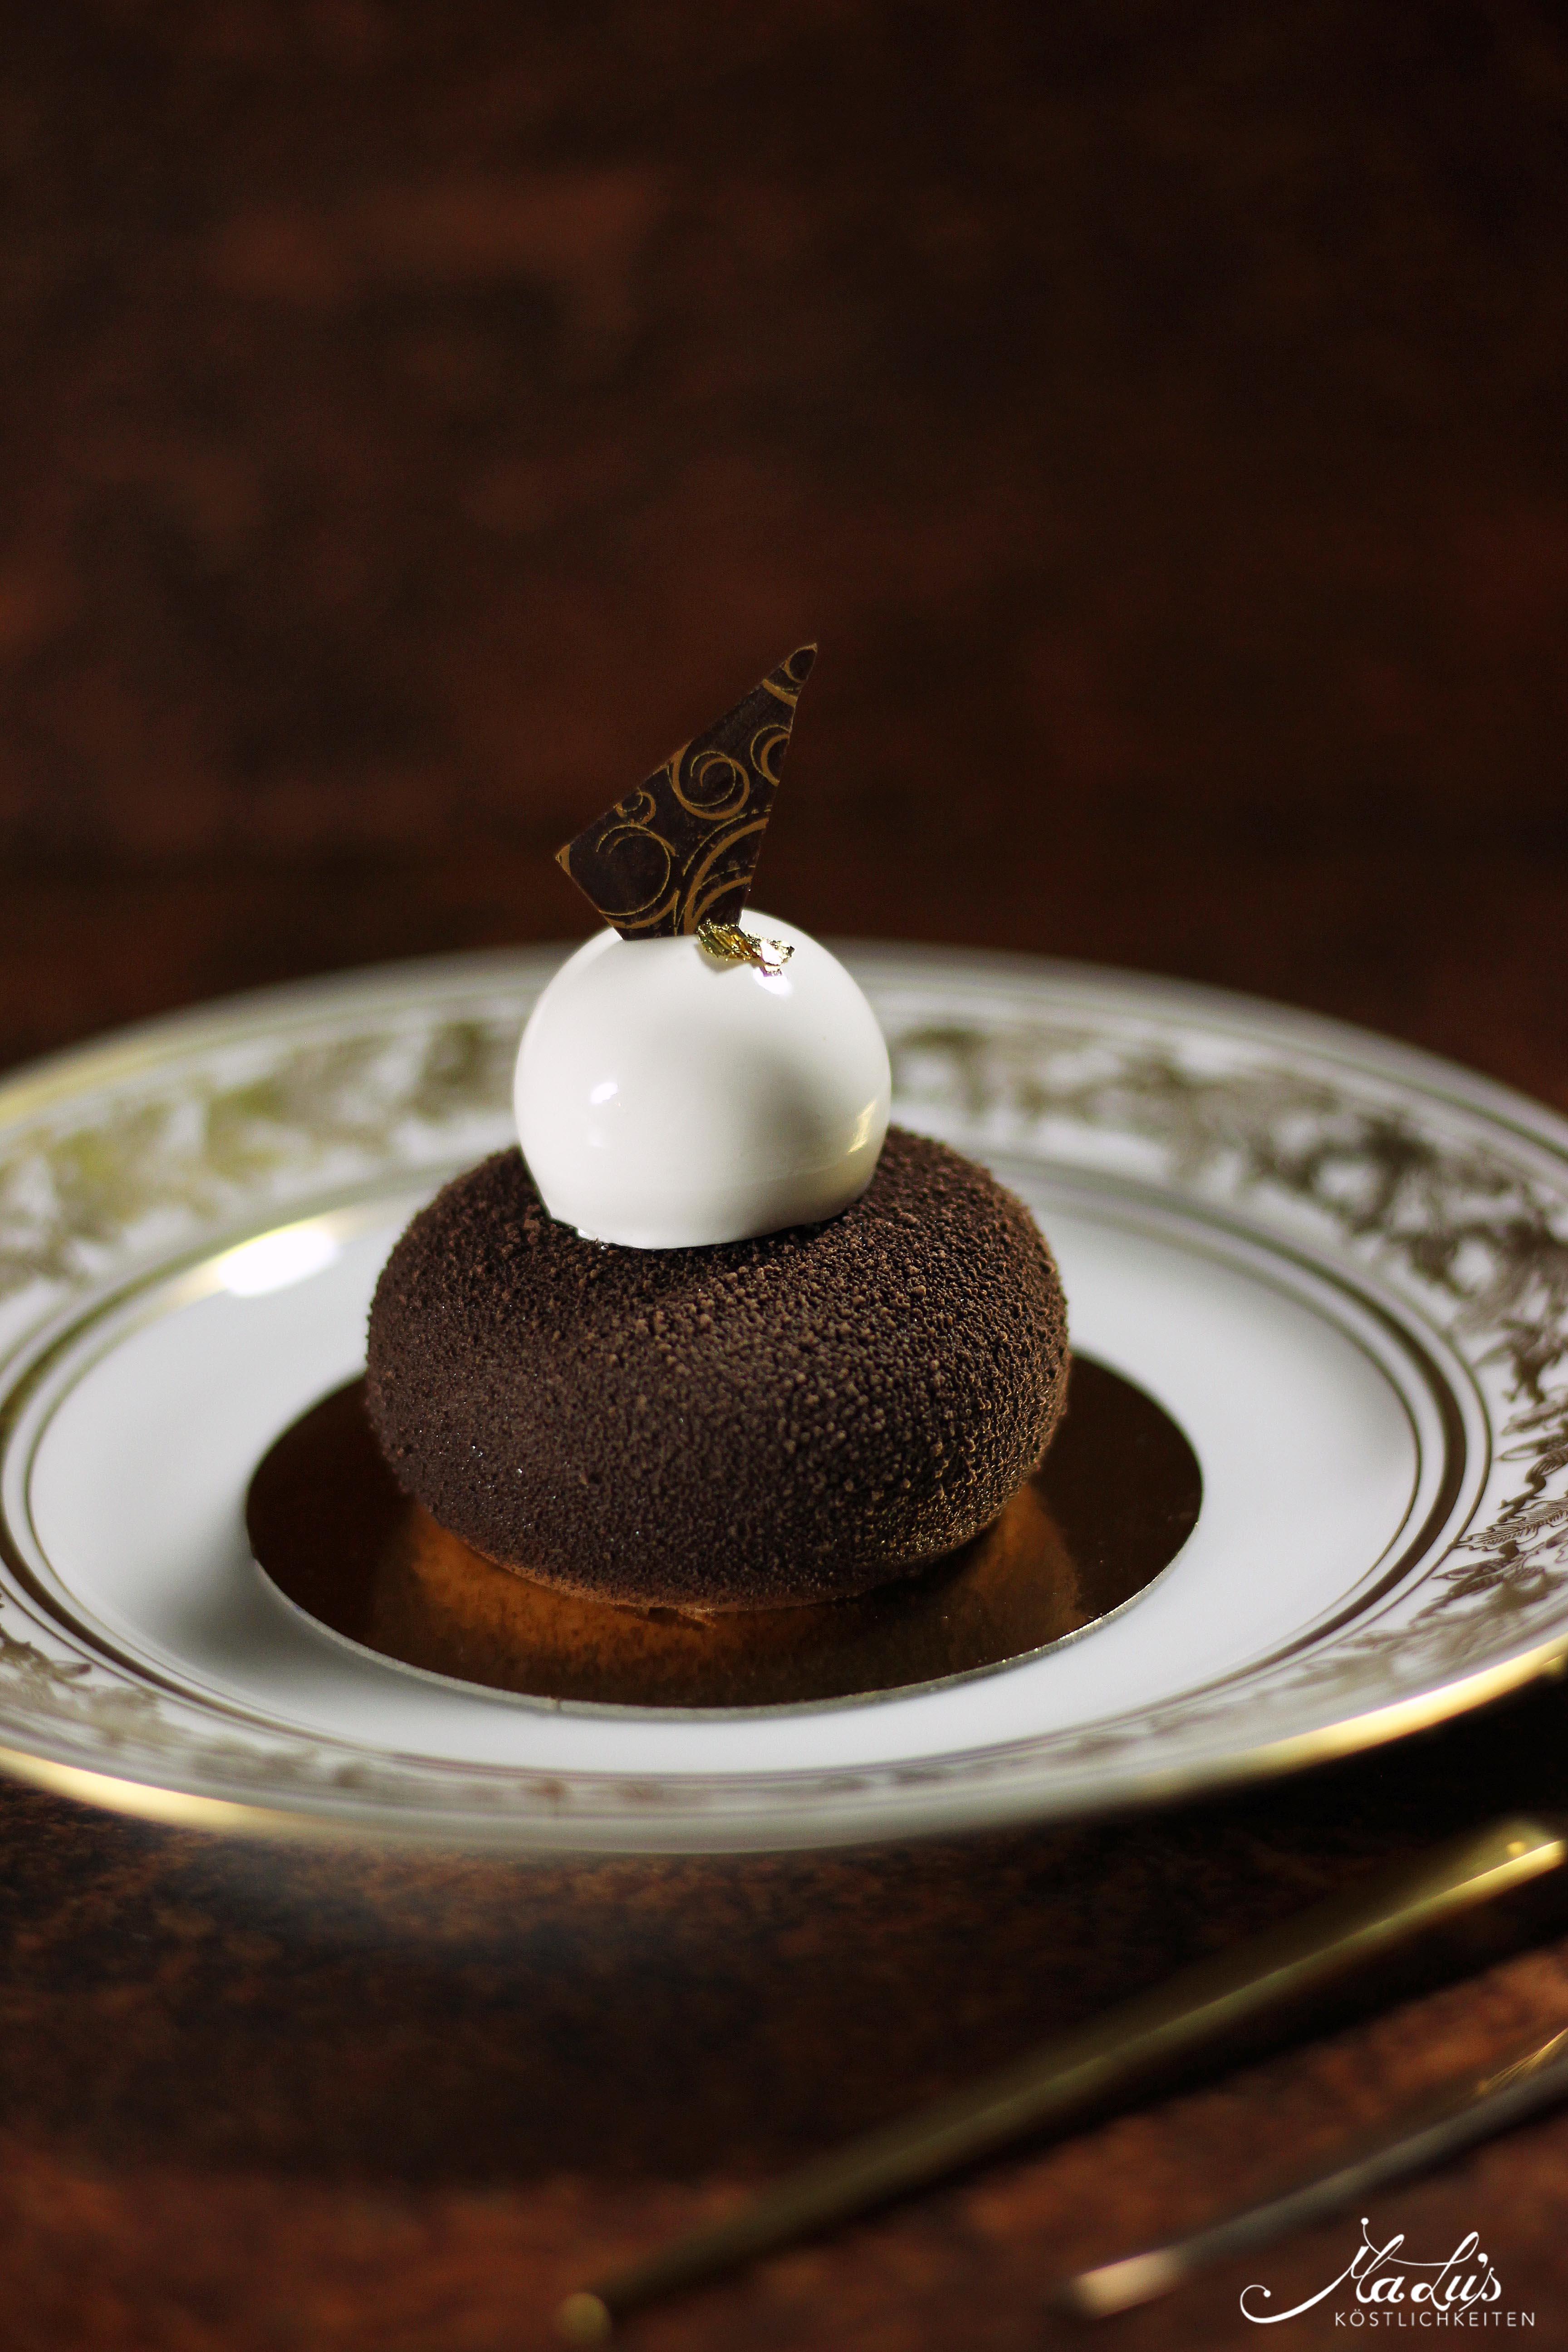 mousse-au-chocolat-to%cc%88rtchen-mit-timutpfeffer-7